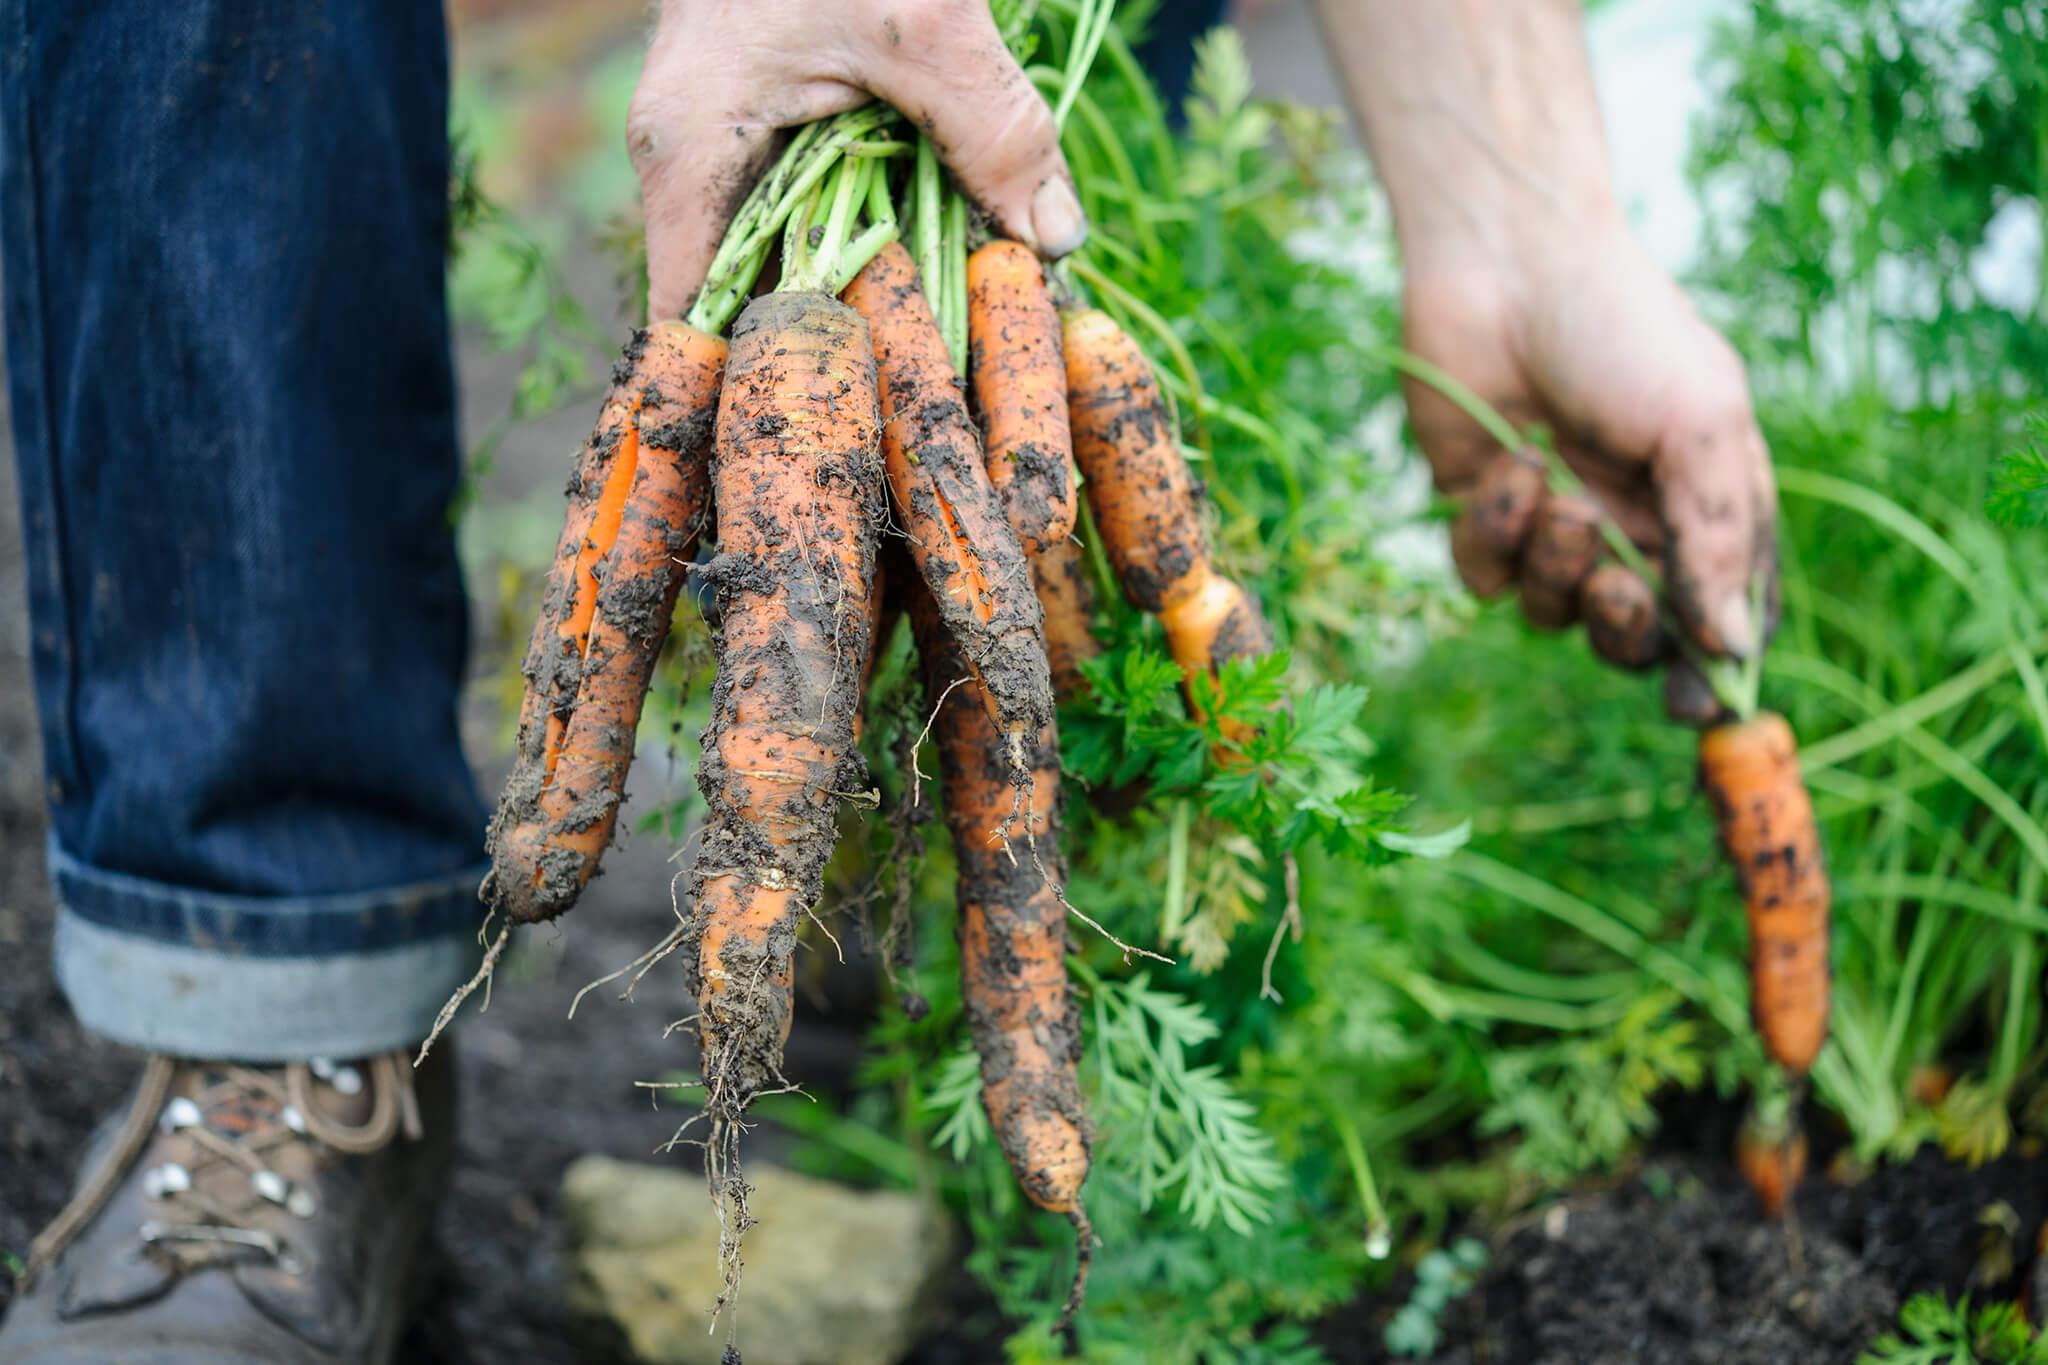 bunch-of-carrots-2